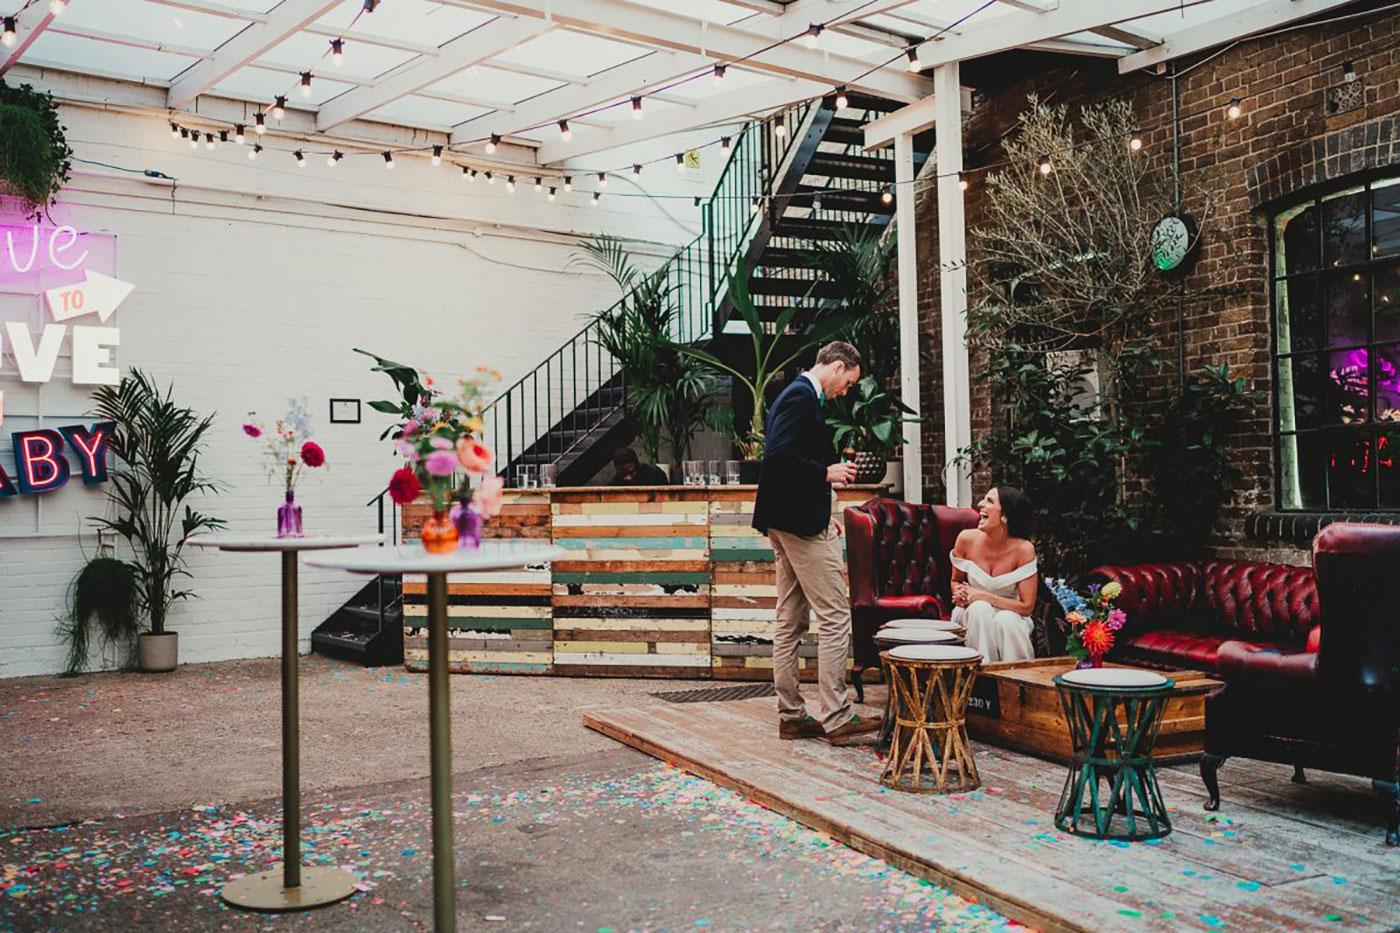 8 Incredible Modern Wedding Venues in the UK